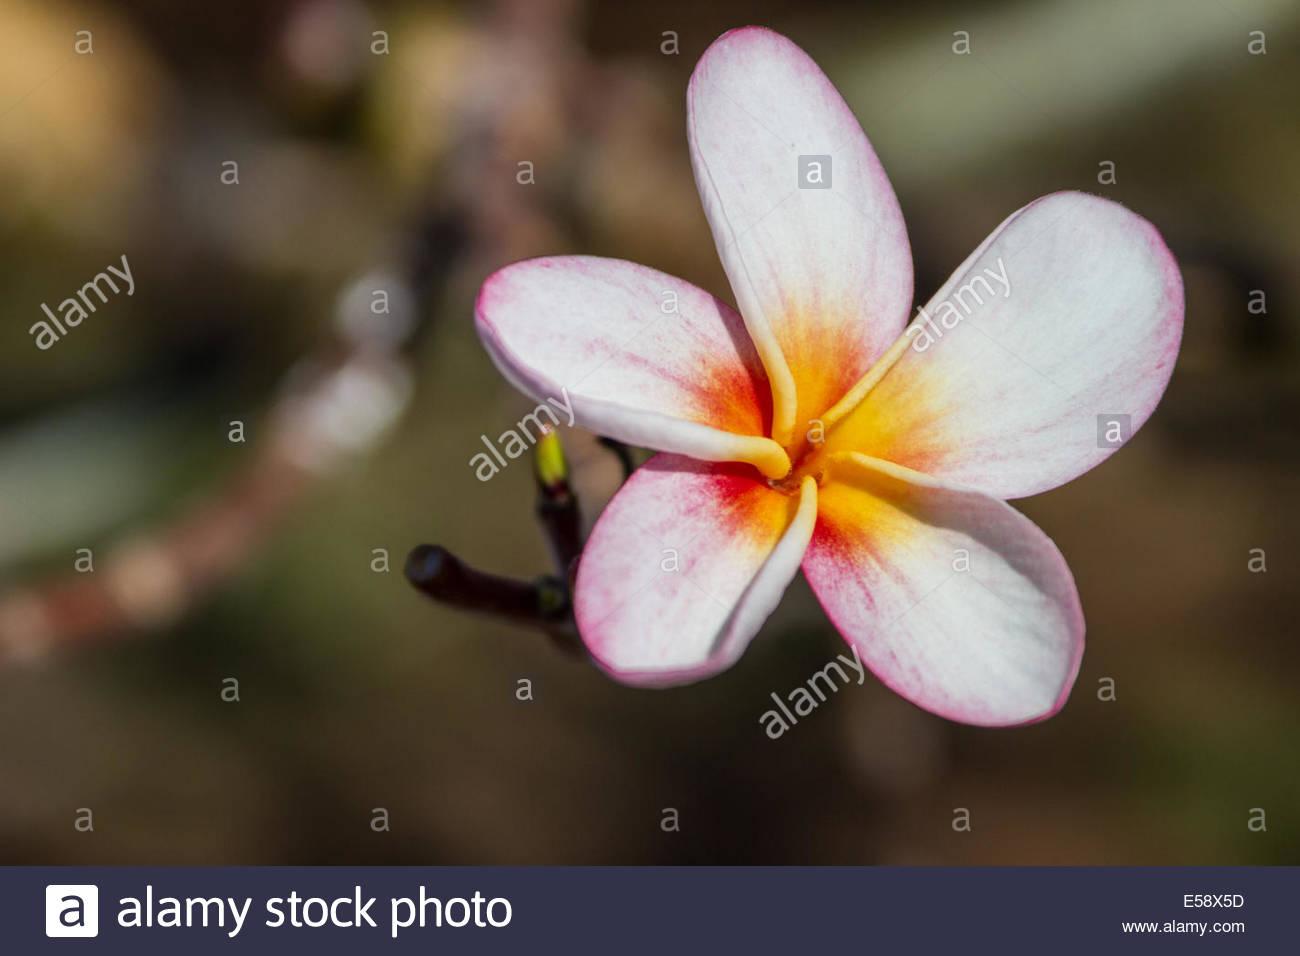 Plumeria flowers, outdoors - Stock Image